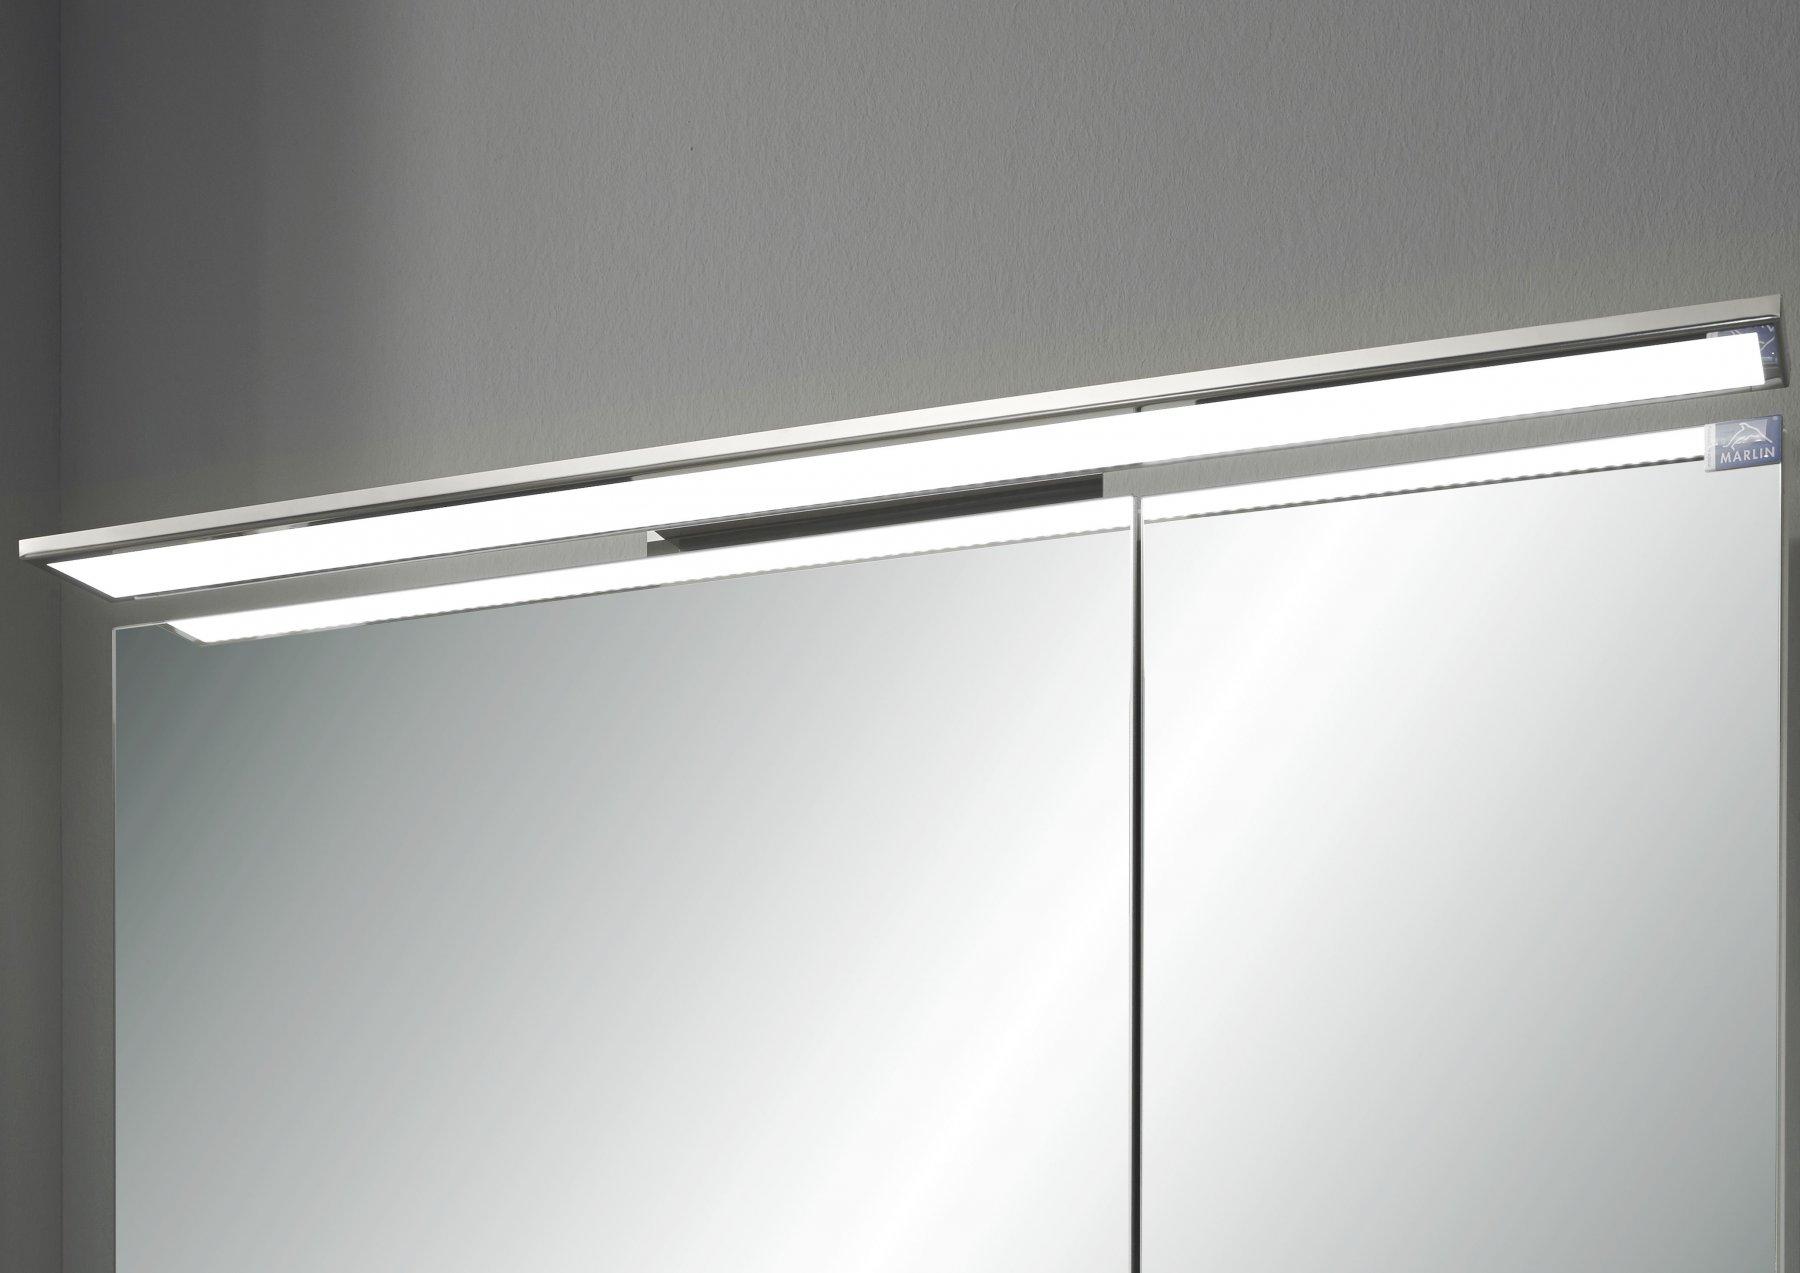 marlin bad 3090 cosmo spiegelschrank 120 cm. Black Bedroom Furniture Sets. Home Design Ideas